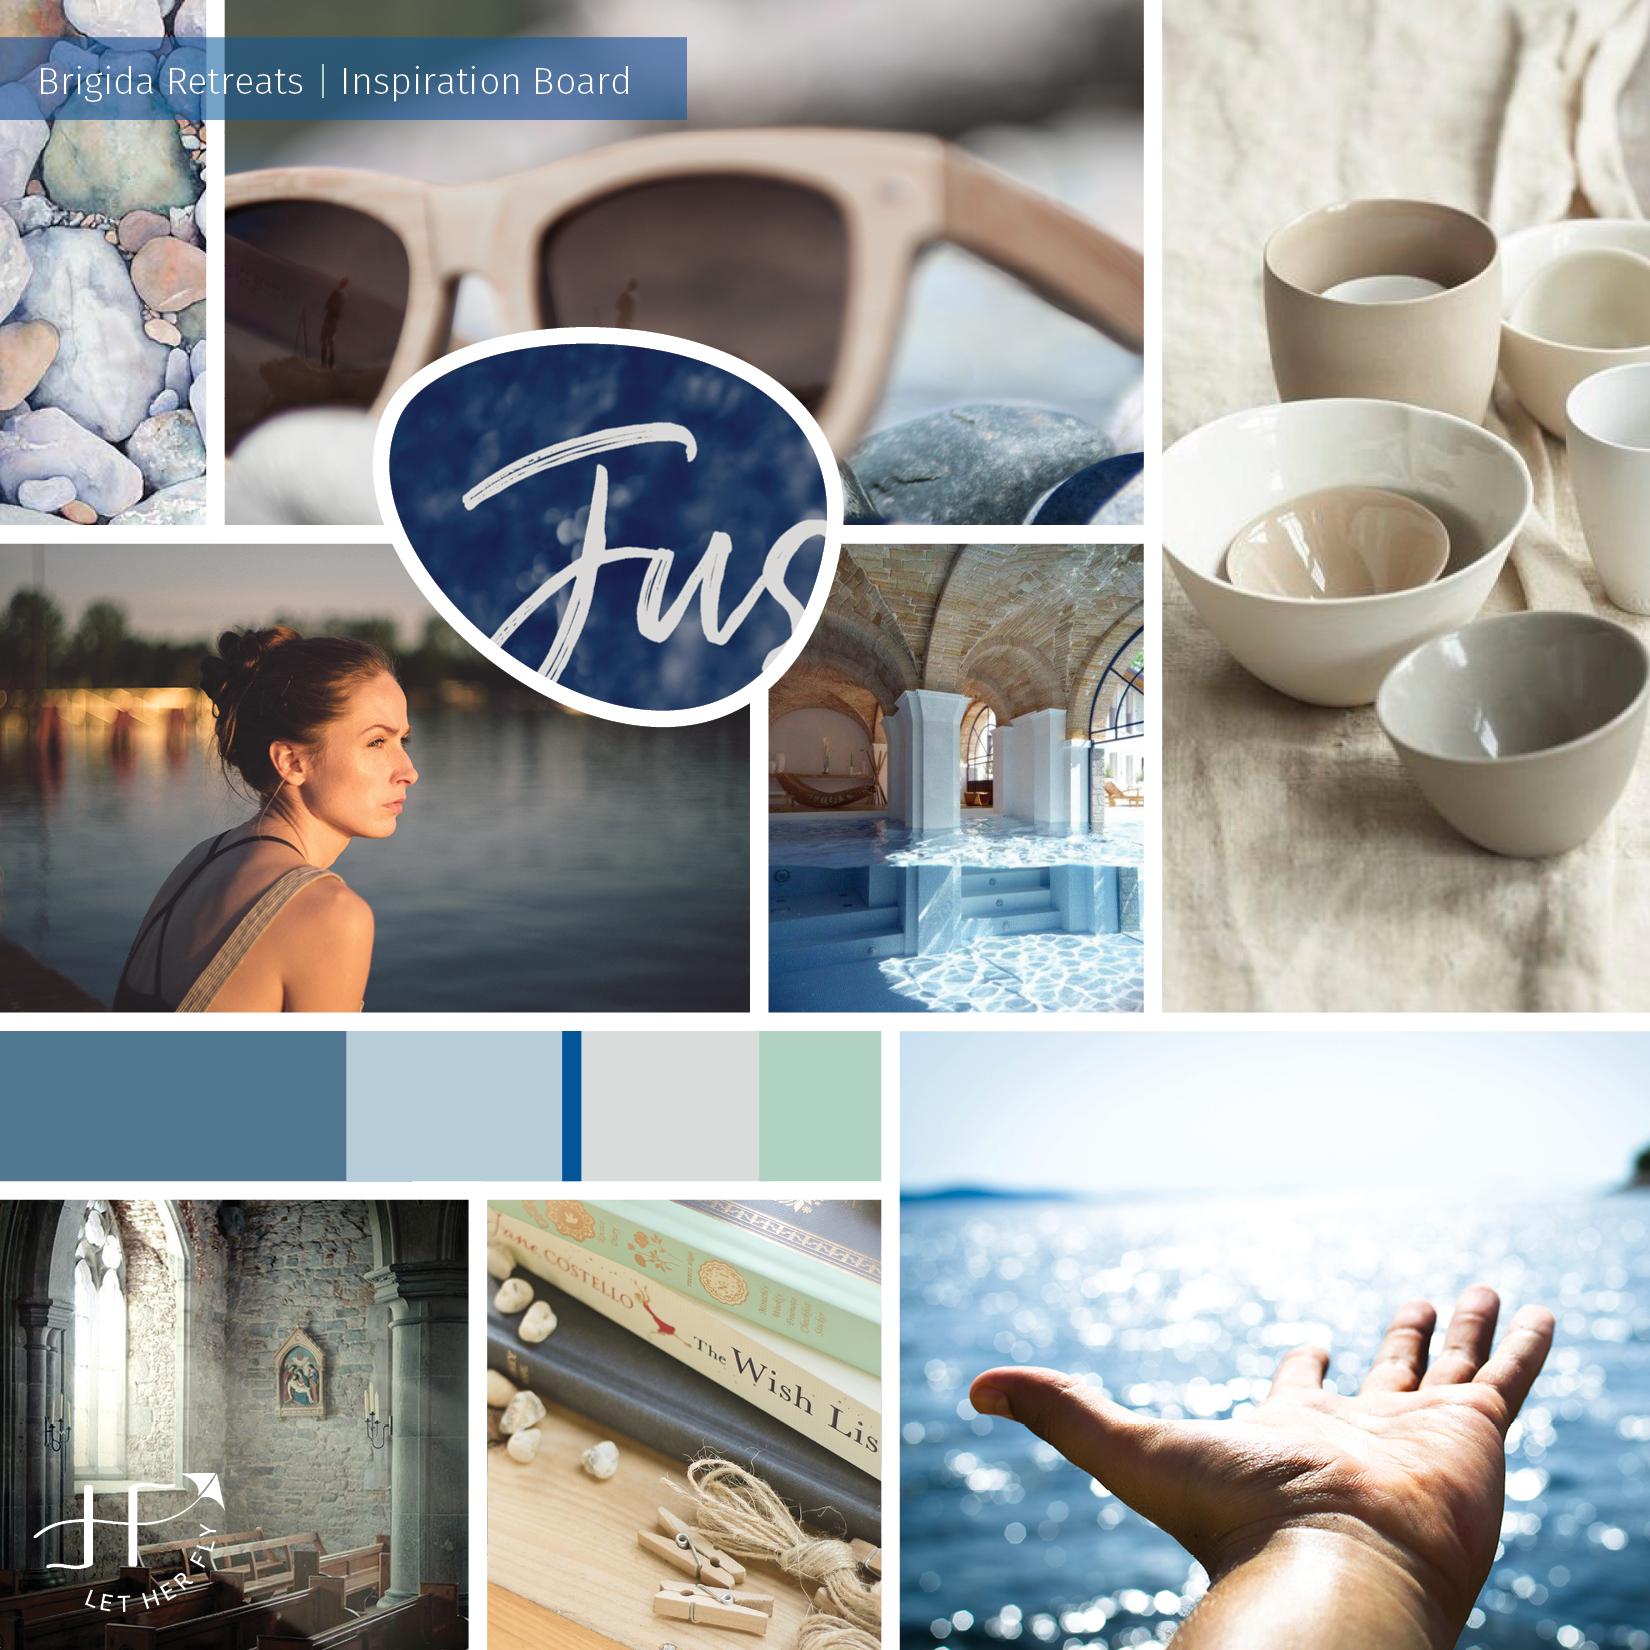 Design Inspiration Board for Brigida Retreats